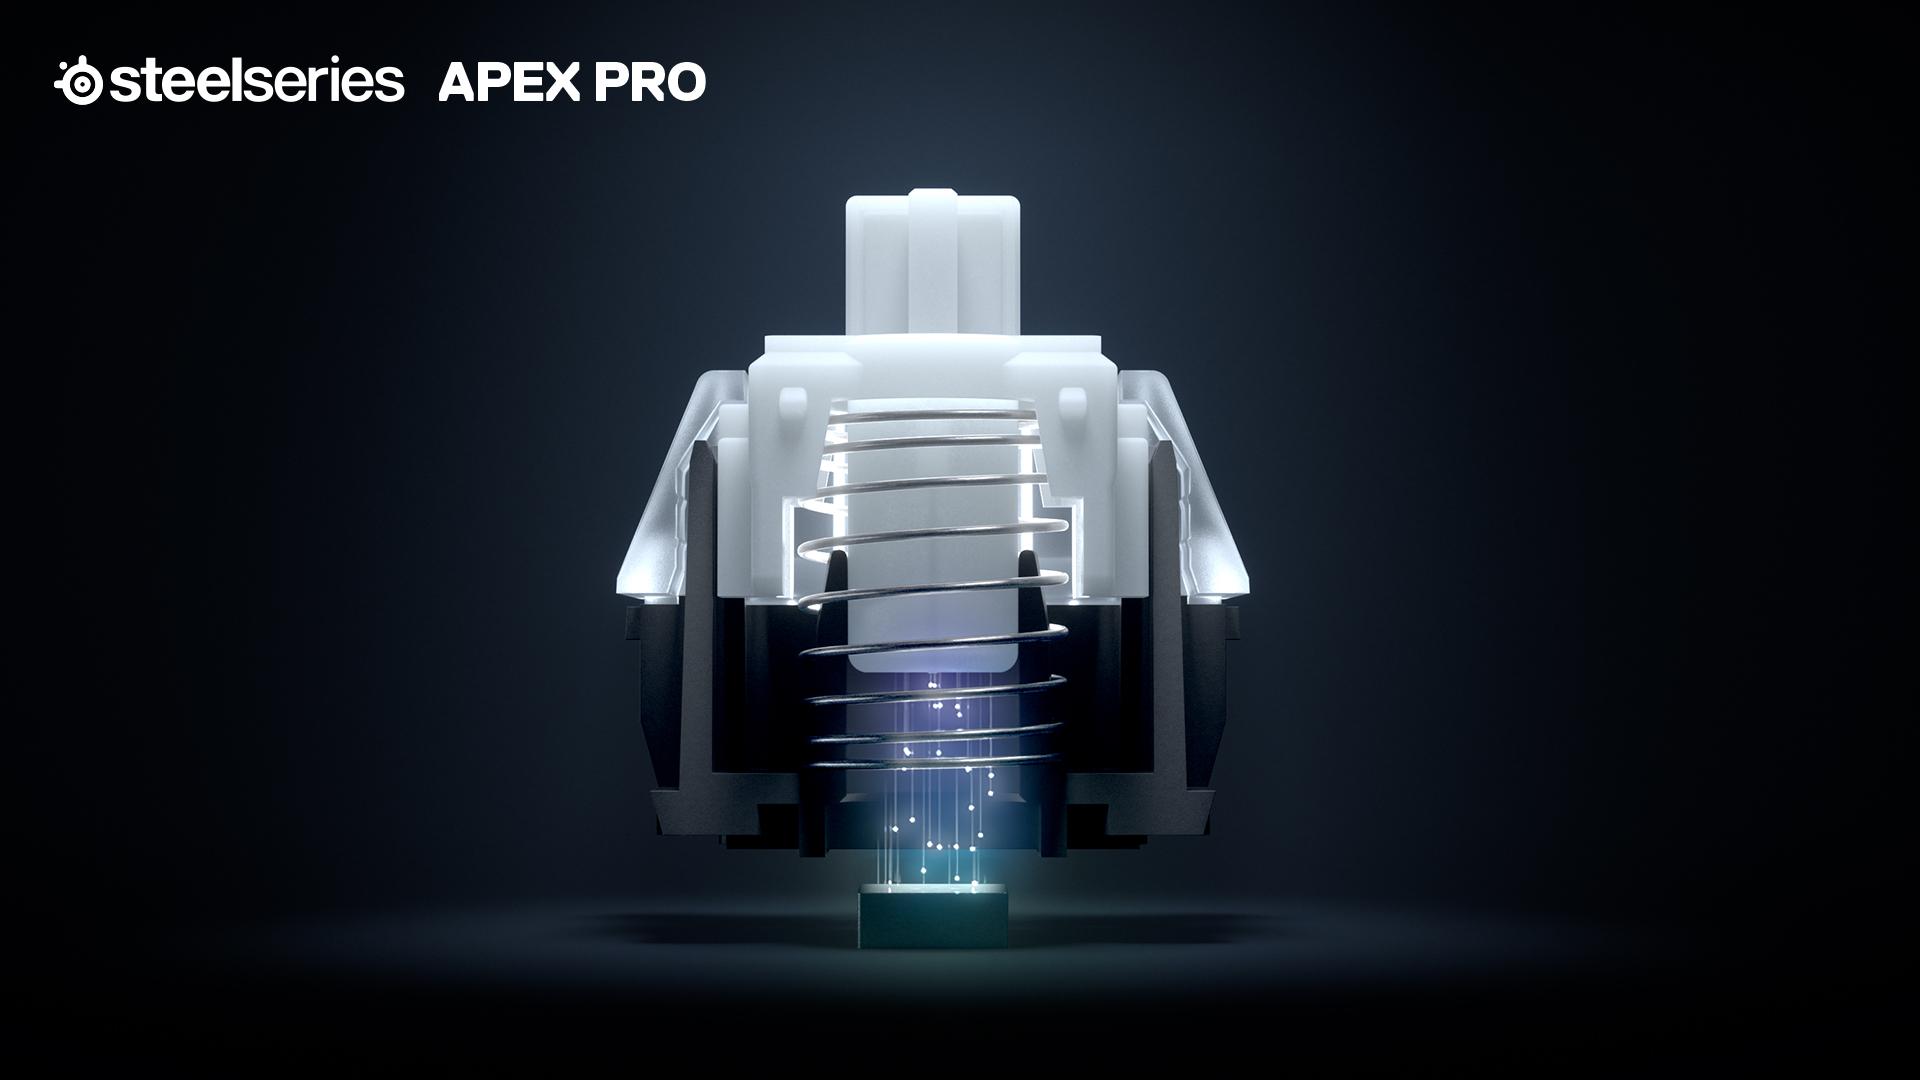 SteelSeries Apex Pro – Features